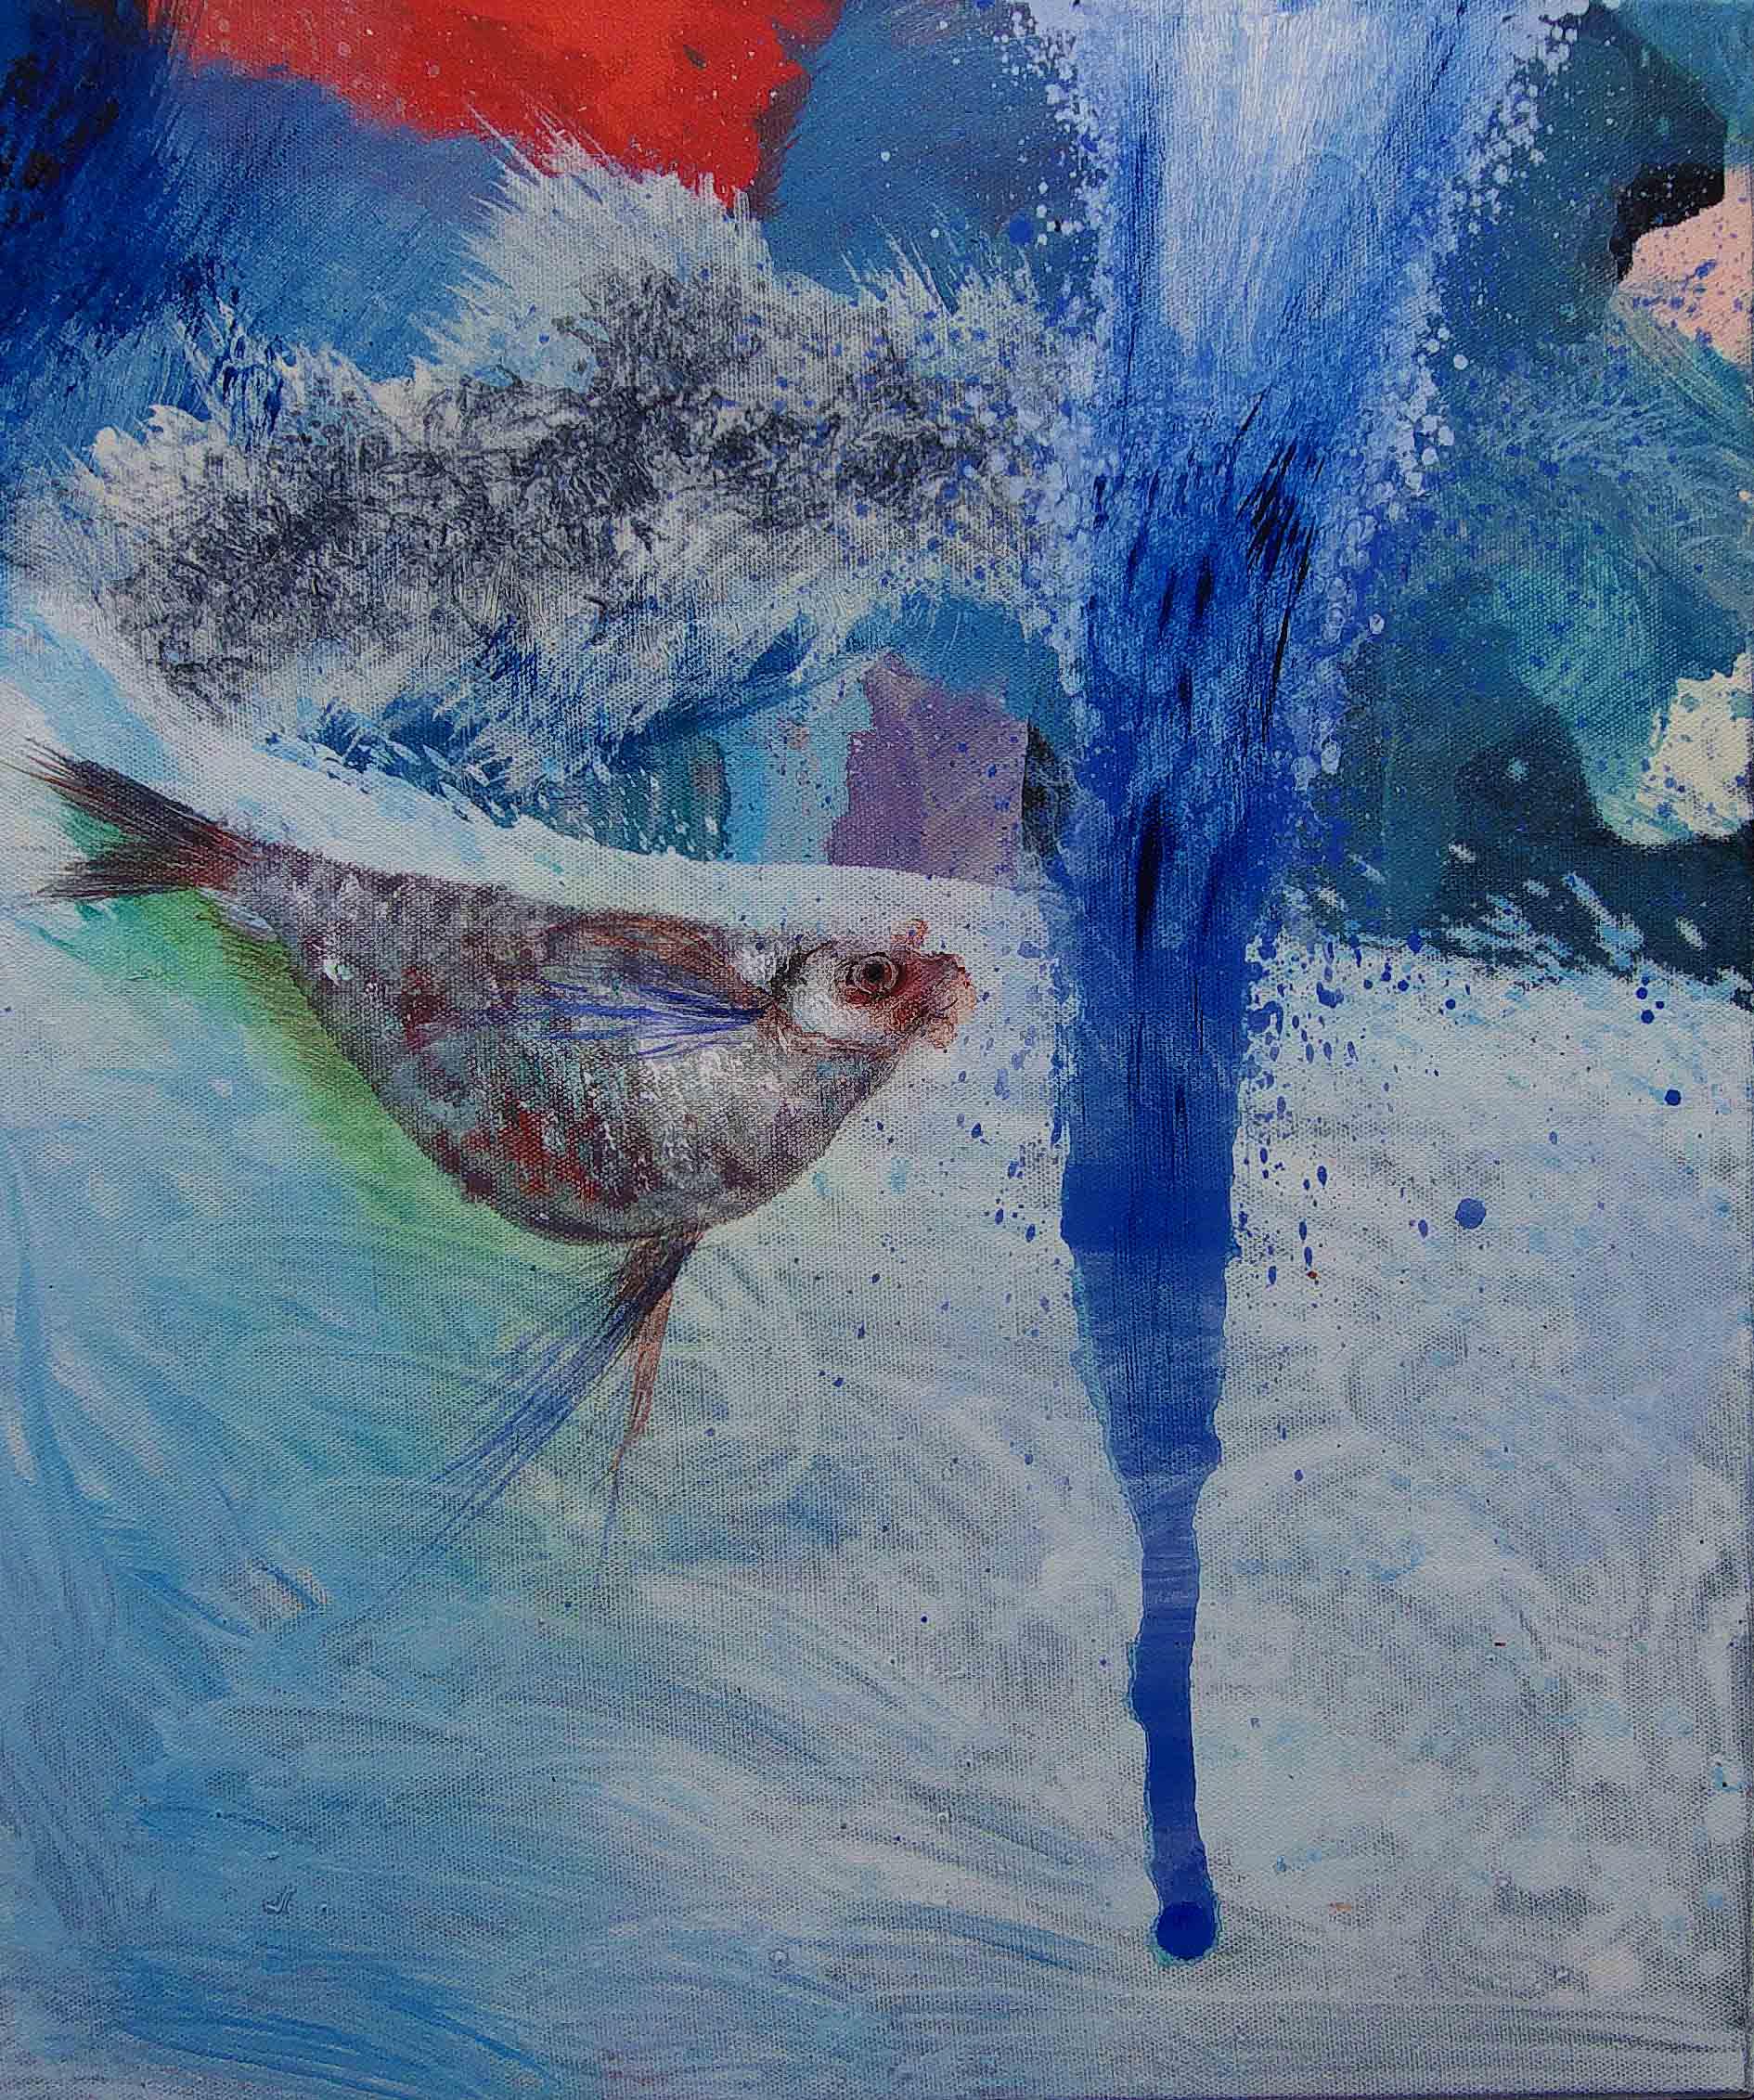 Agua. 2015. Acrílico,óleo sobre tela. 55 x 46 cm